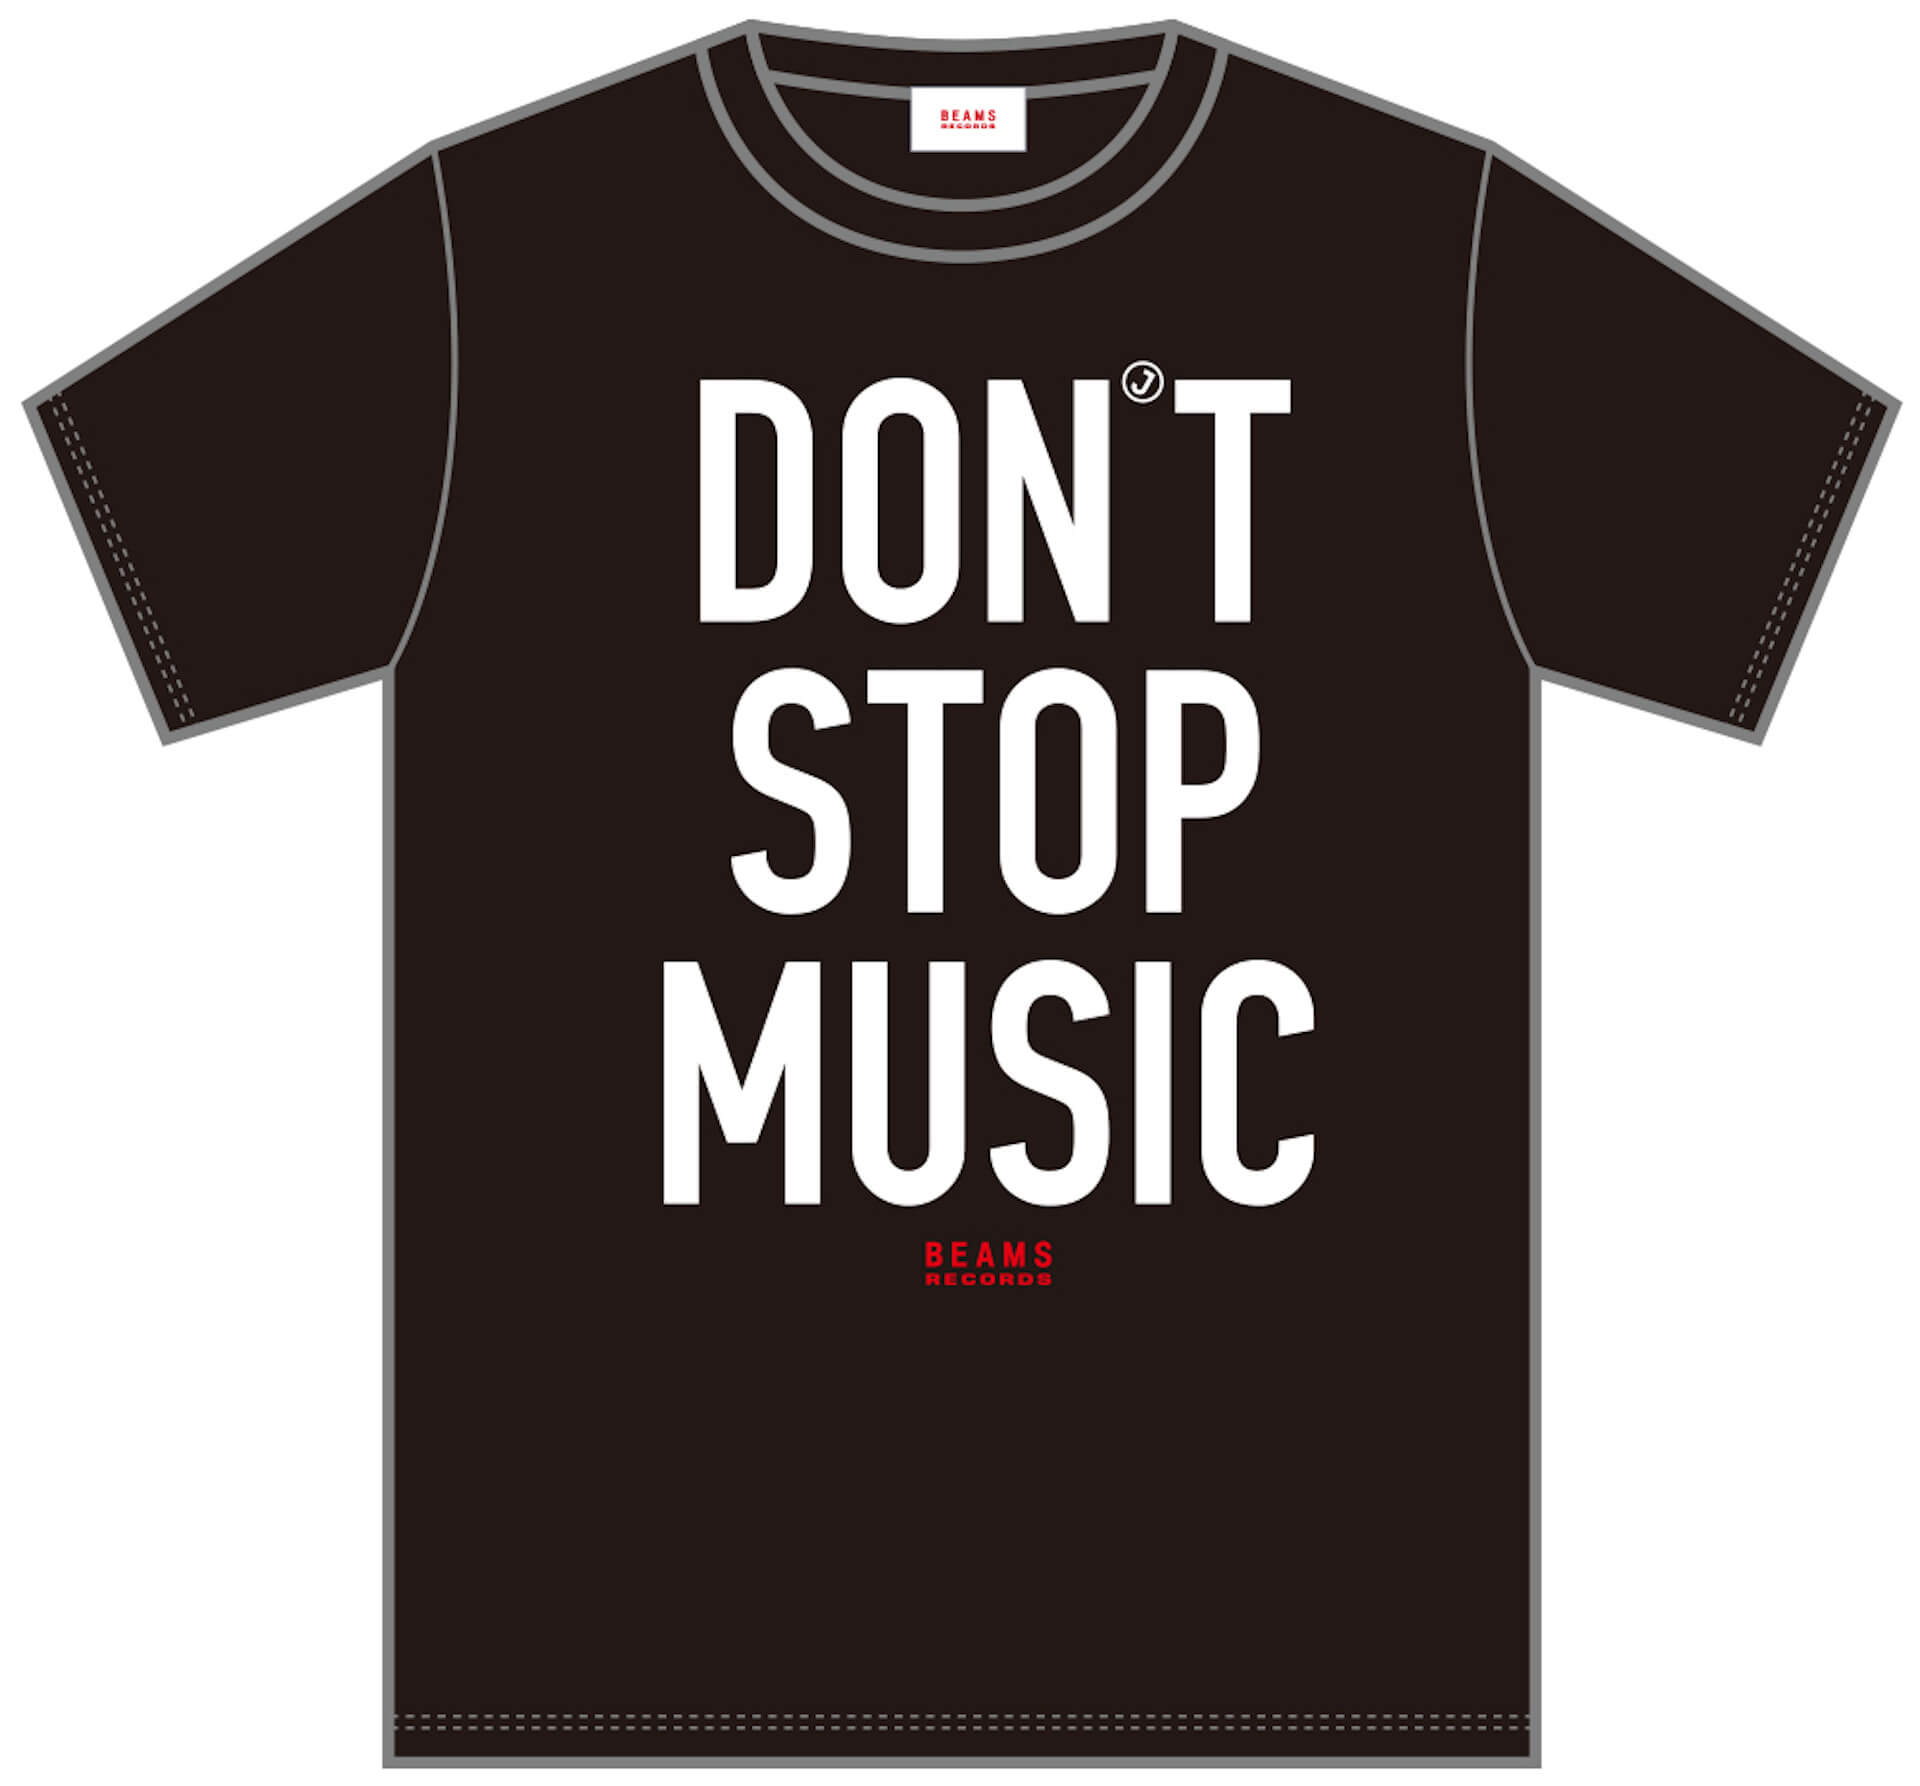 J-WAVE「#音楽を止めるな」BEAMS RECORDS協力のもと、ライブハウスを支援するオリジナルTシャツが受注販売開始! lf200515_jwave_beamsrecords_tshirts_02